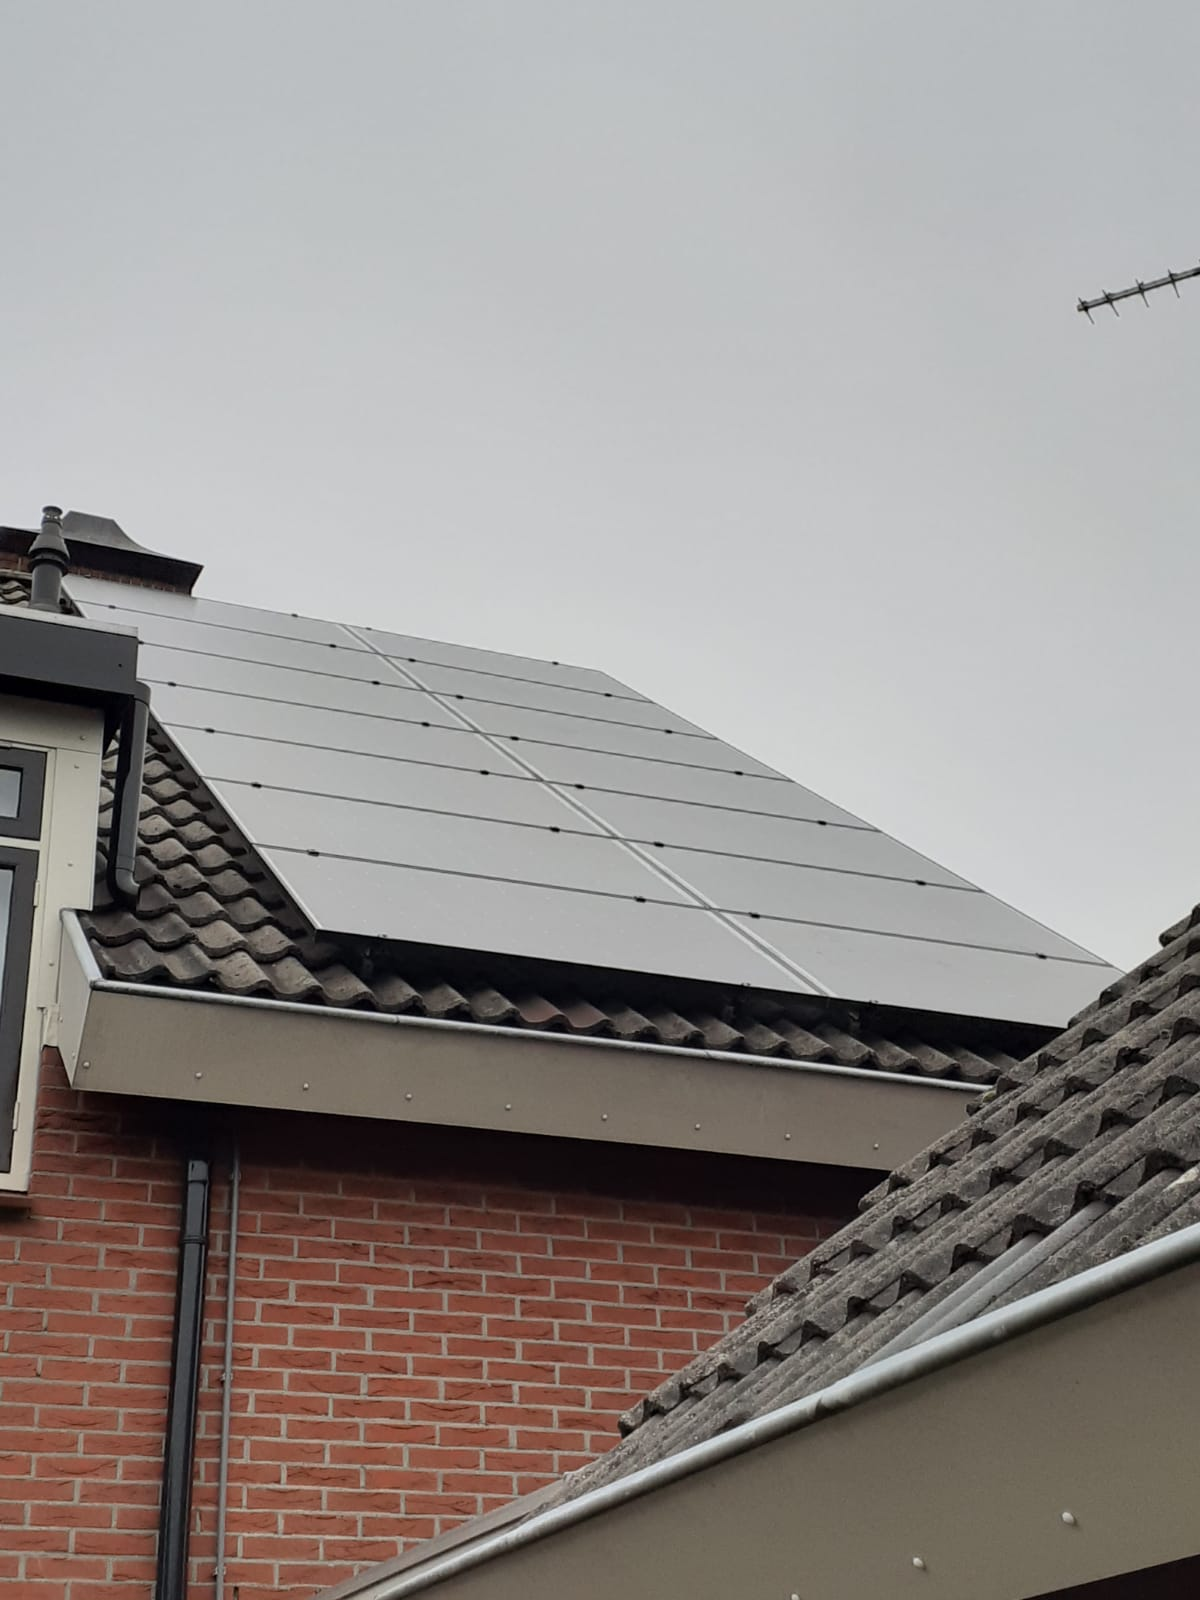 Solarwatt glas glas zonnepanelen in Elim